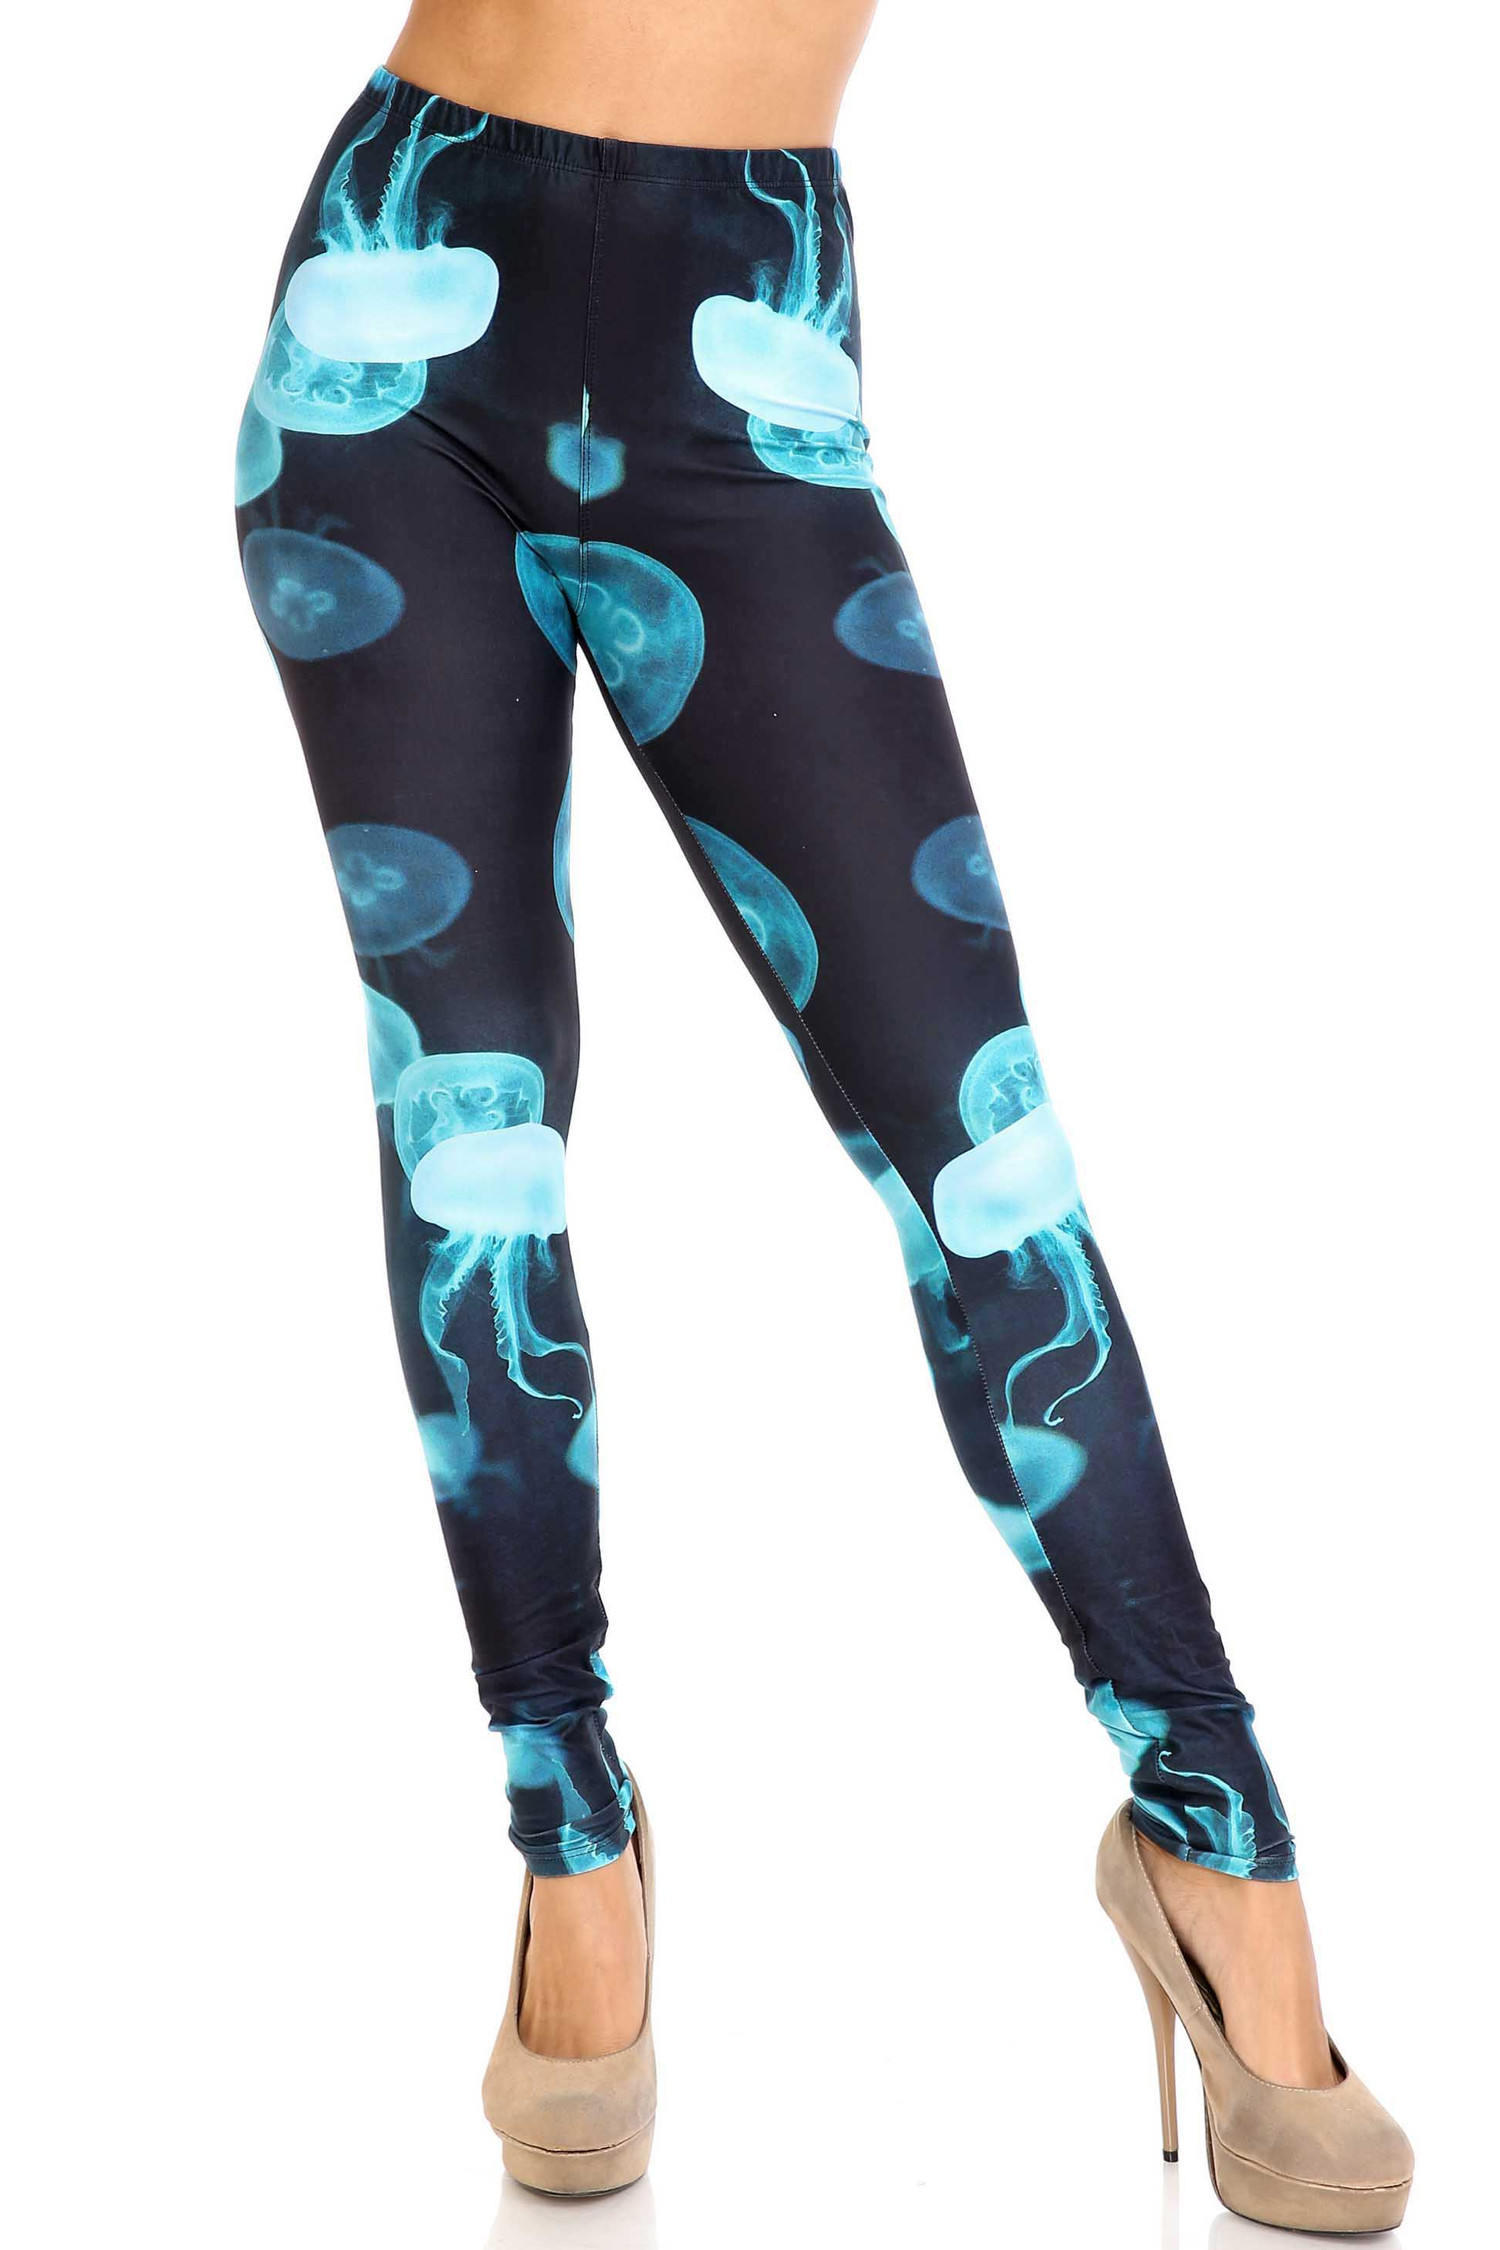 Creamy Soft Electric Blue Jelly Fish Plus Size Leggings - USA Fashion™